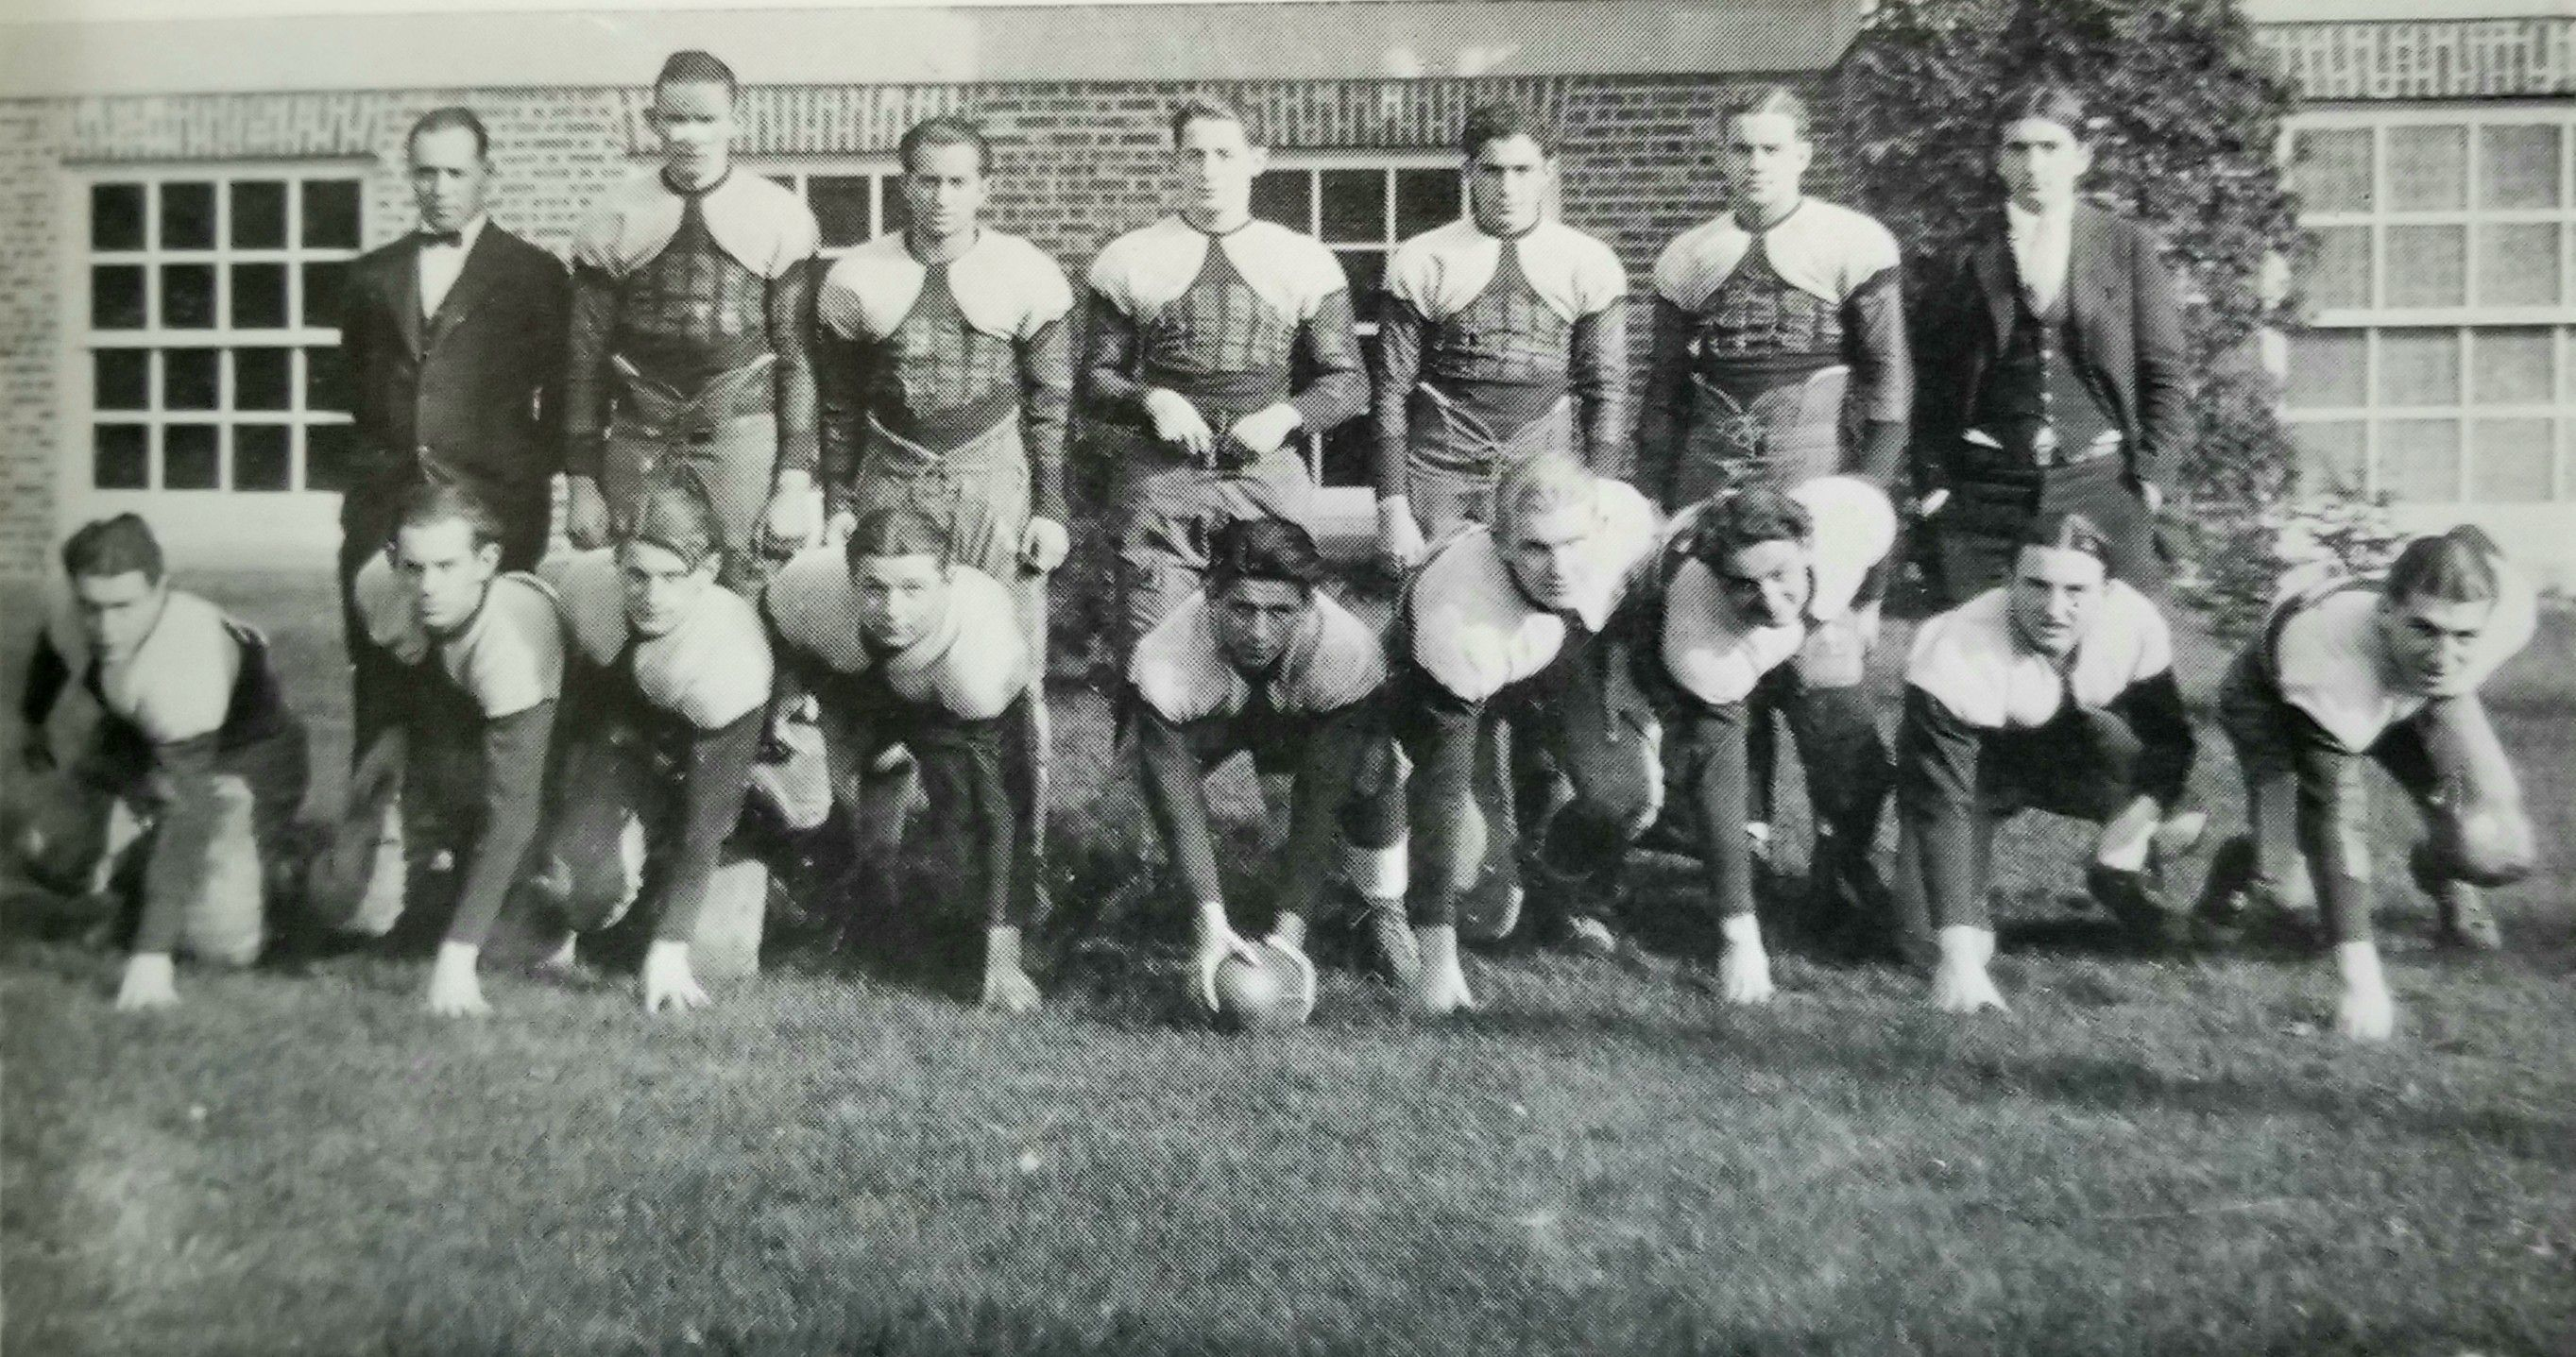 1926 lakewood piners football team photo 2 source 1927